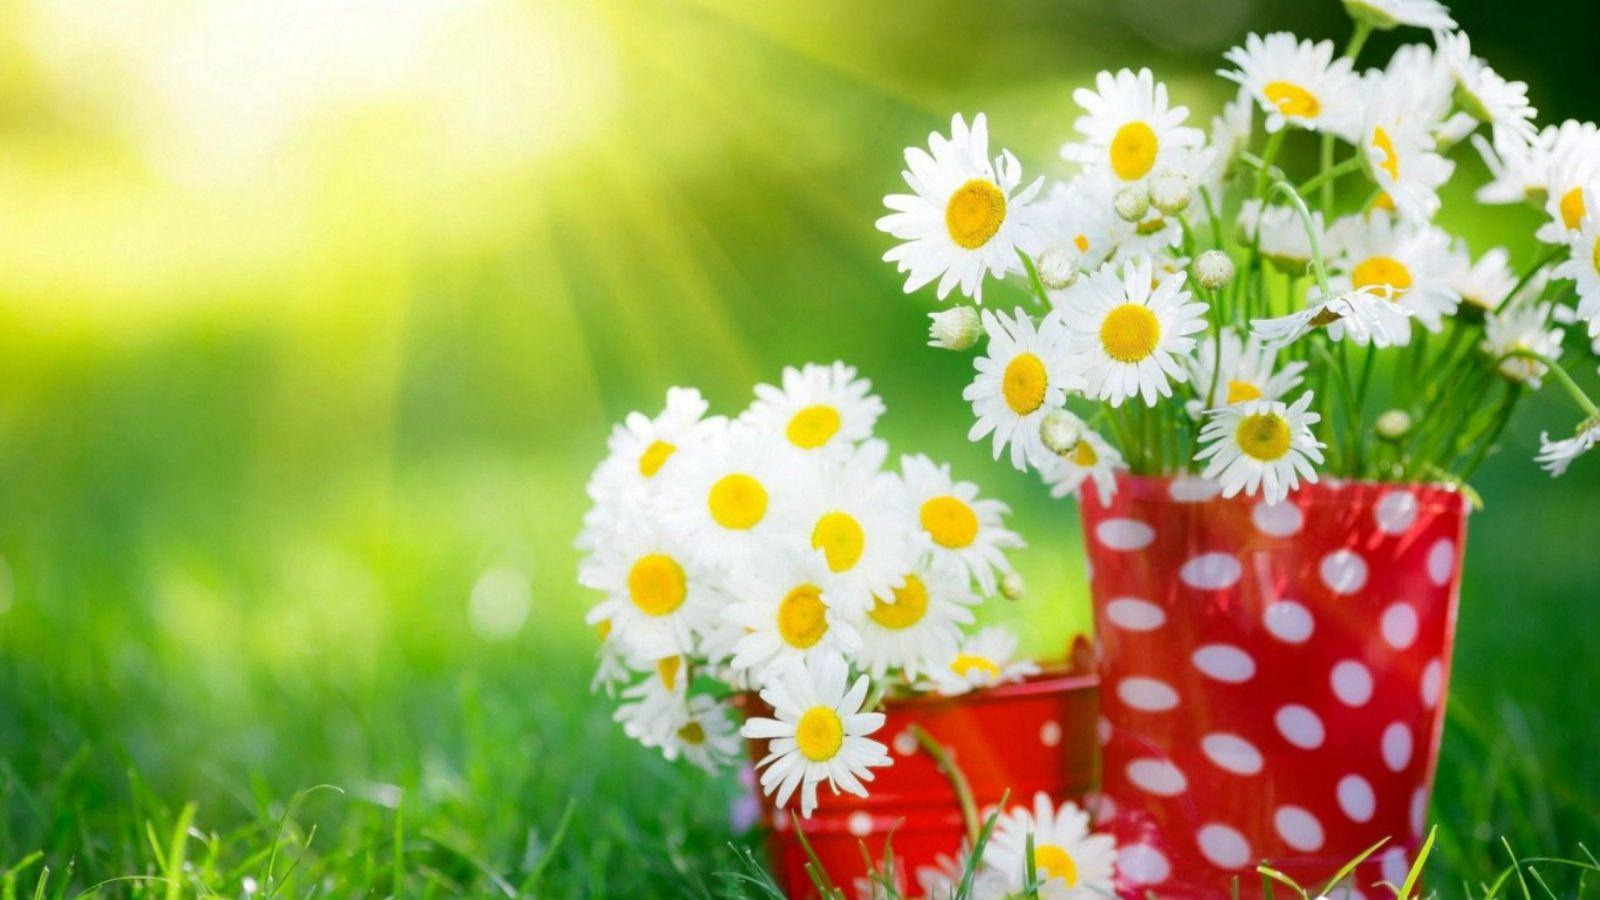 Most Beautiful Flowers Wallpapers For Desktop Wallpaper Cave